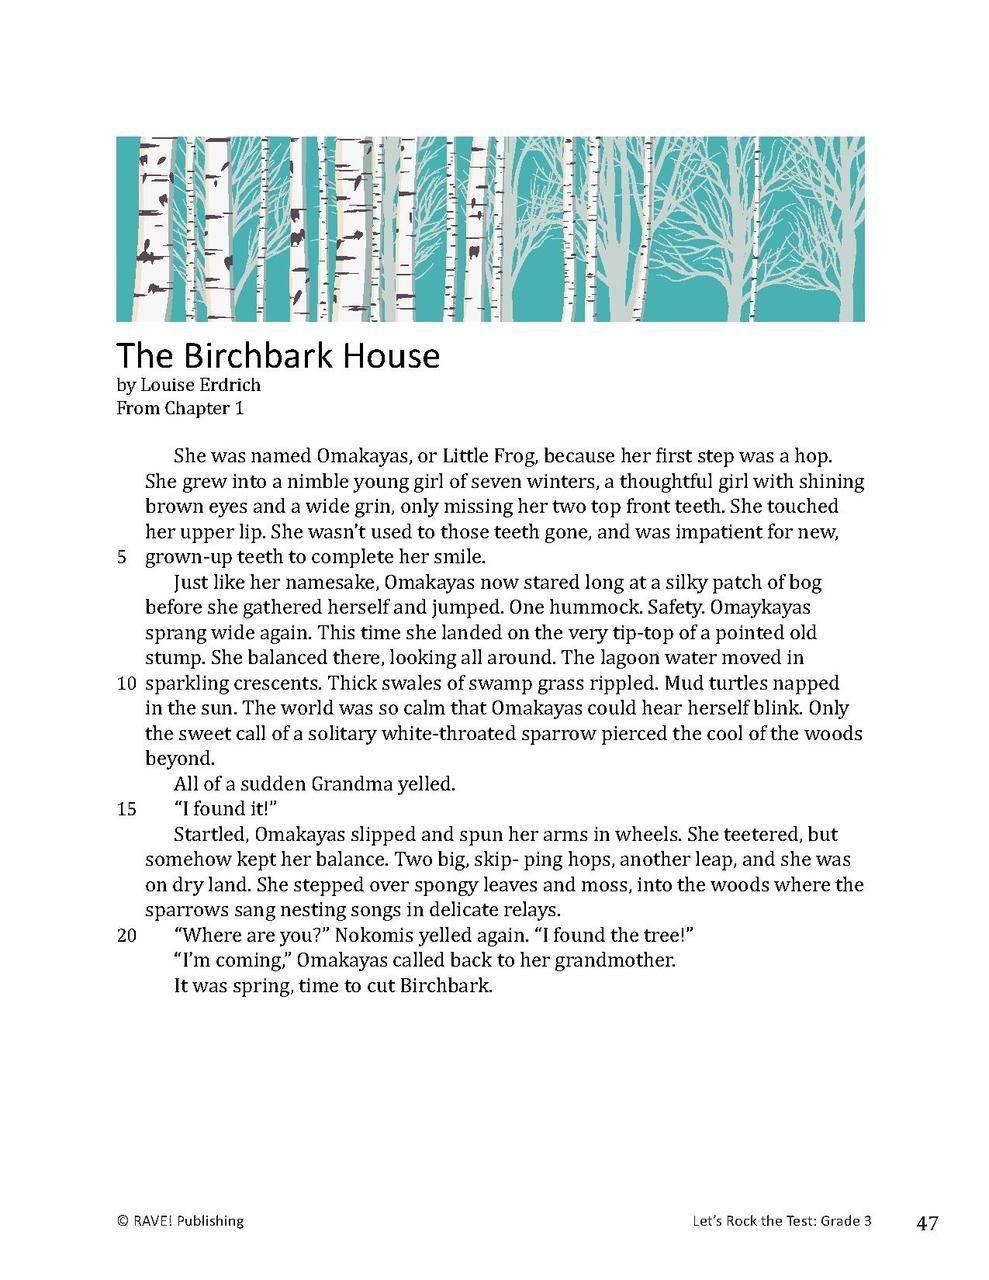 state assessment practice the birchbark house 3 multiple choice